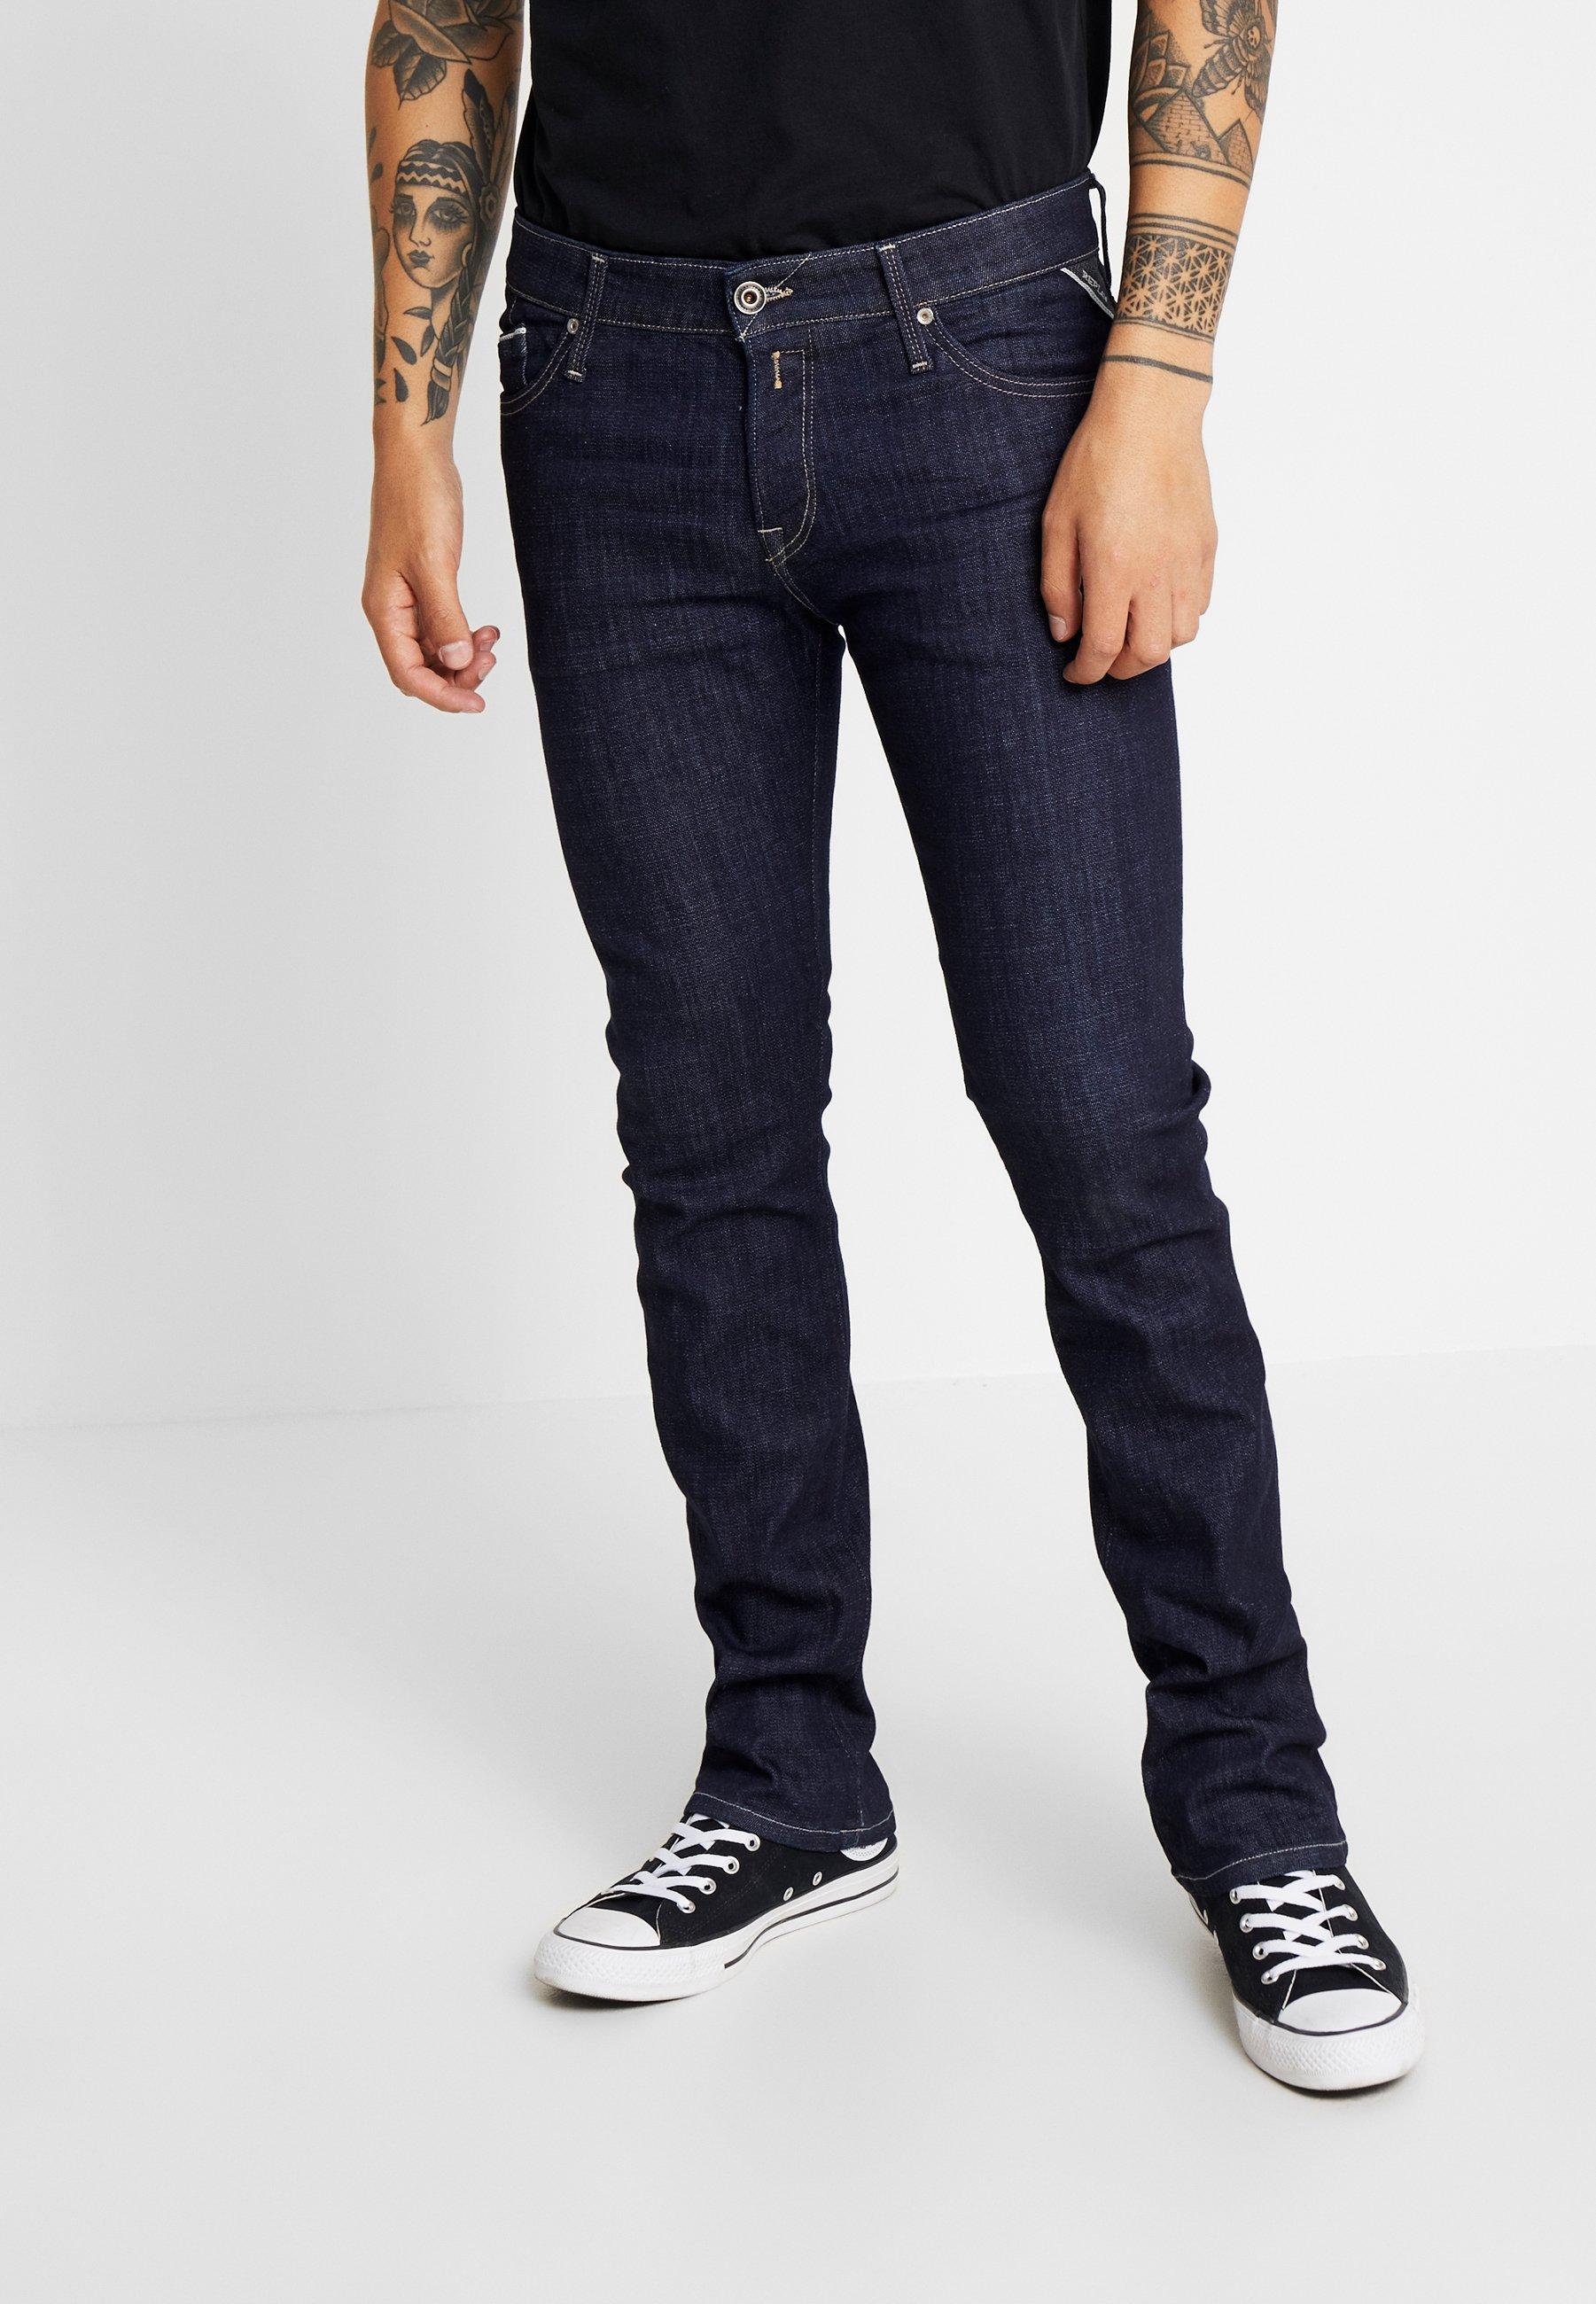 Replay New Jimi - Bootcut Jeans Dark Blue QMxuGpvY IbkdYaEY